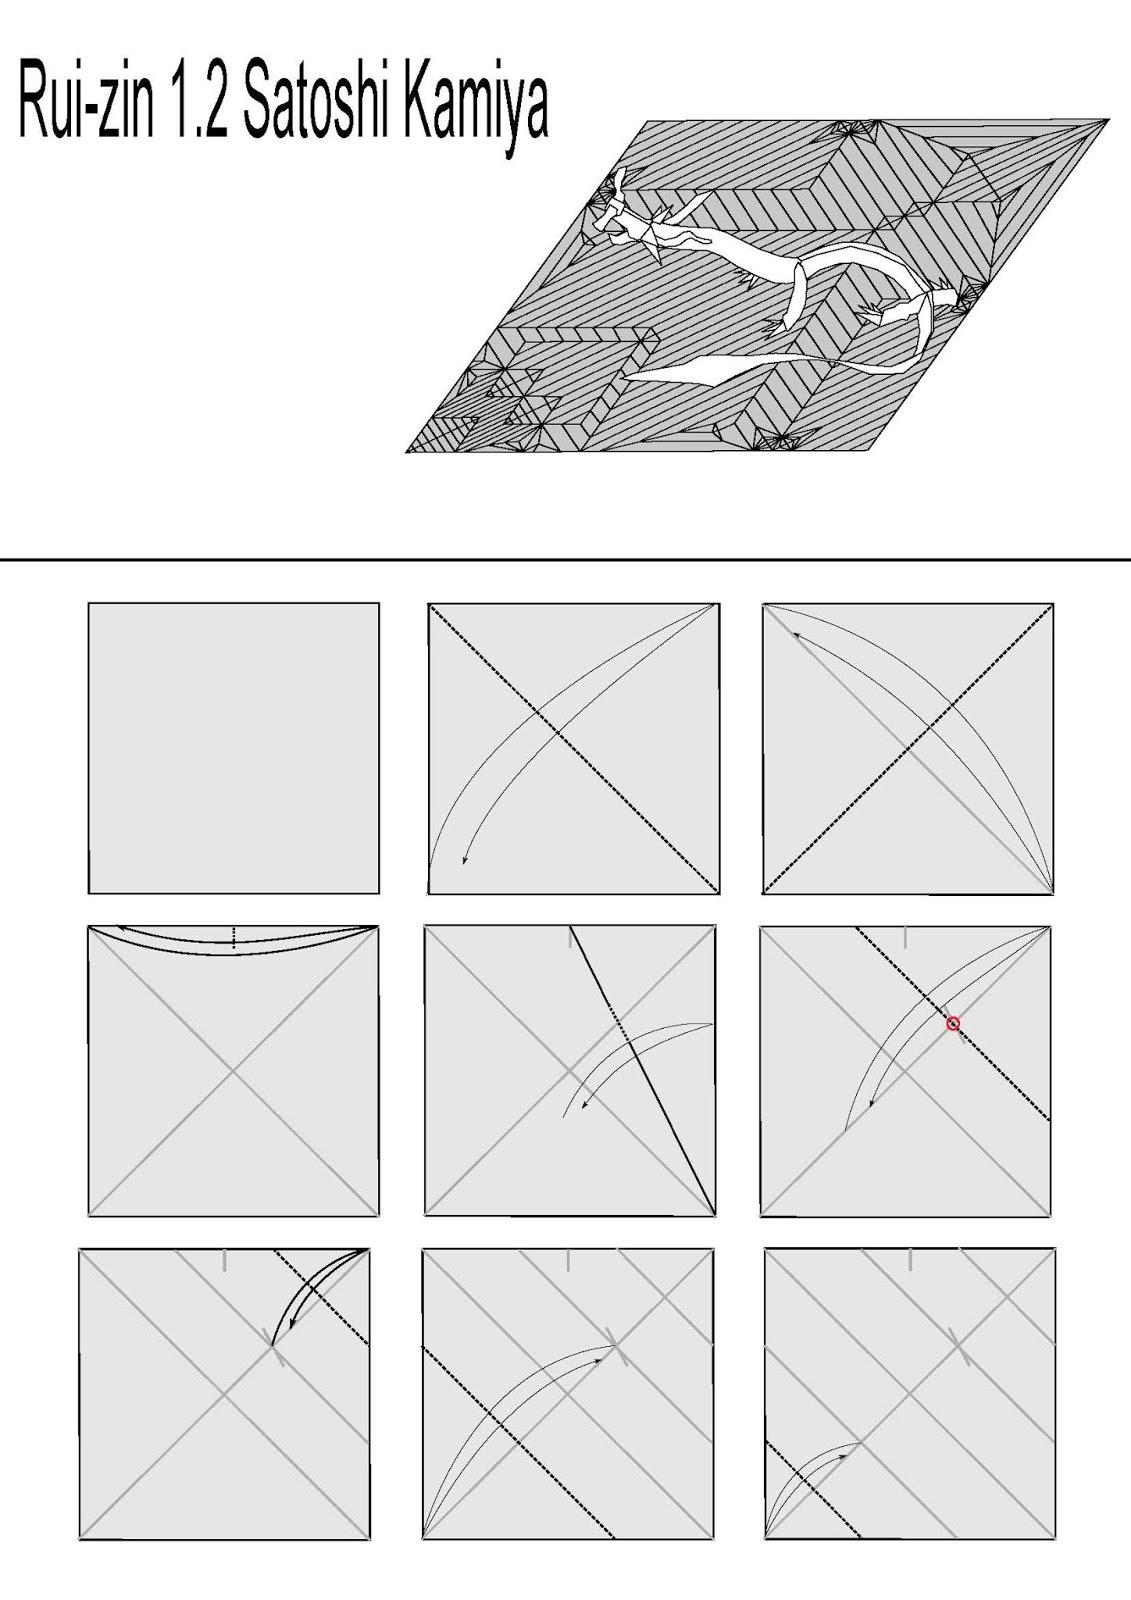 Origami Ryujin 1 2 Diagram Wiring Diagrams 5a Ubec Max 75a Universal Battery Eliminator Circuit 5v Or 6v Option Satoshi Kamiya Nhat S Rh Origamivnnhatpro Blogspot Com Mantis Shrimp